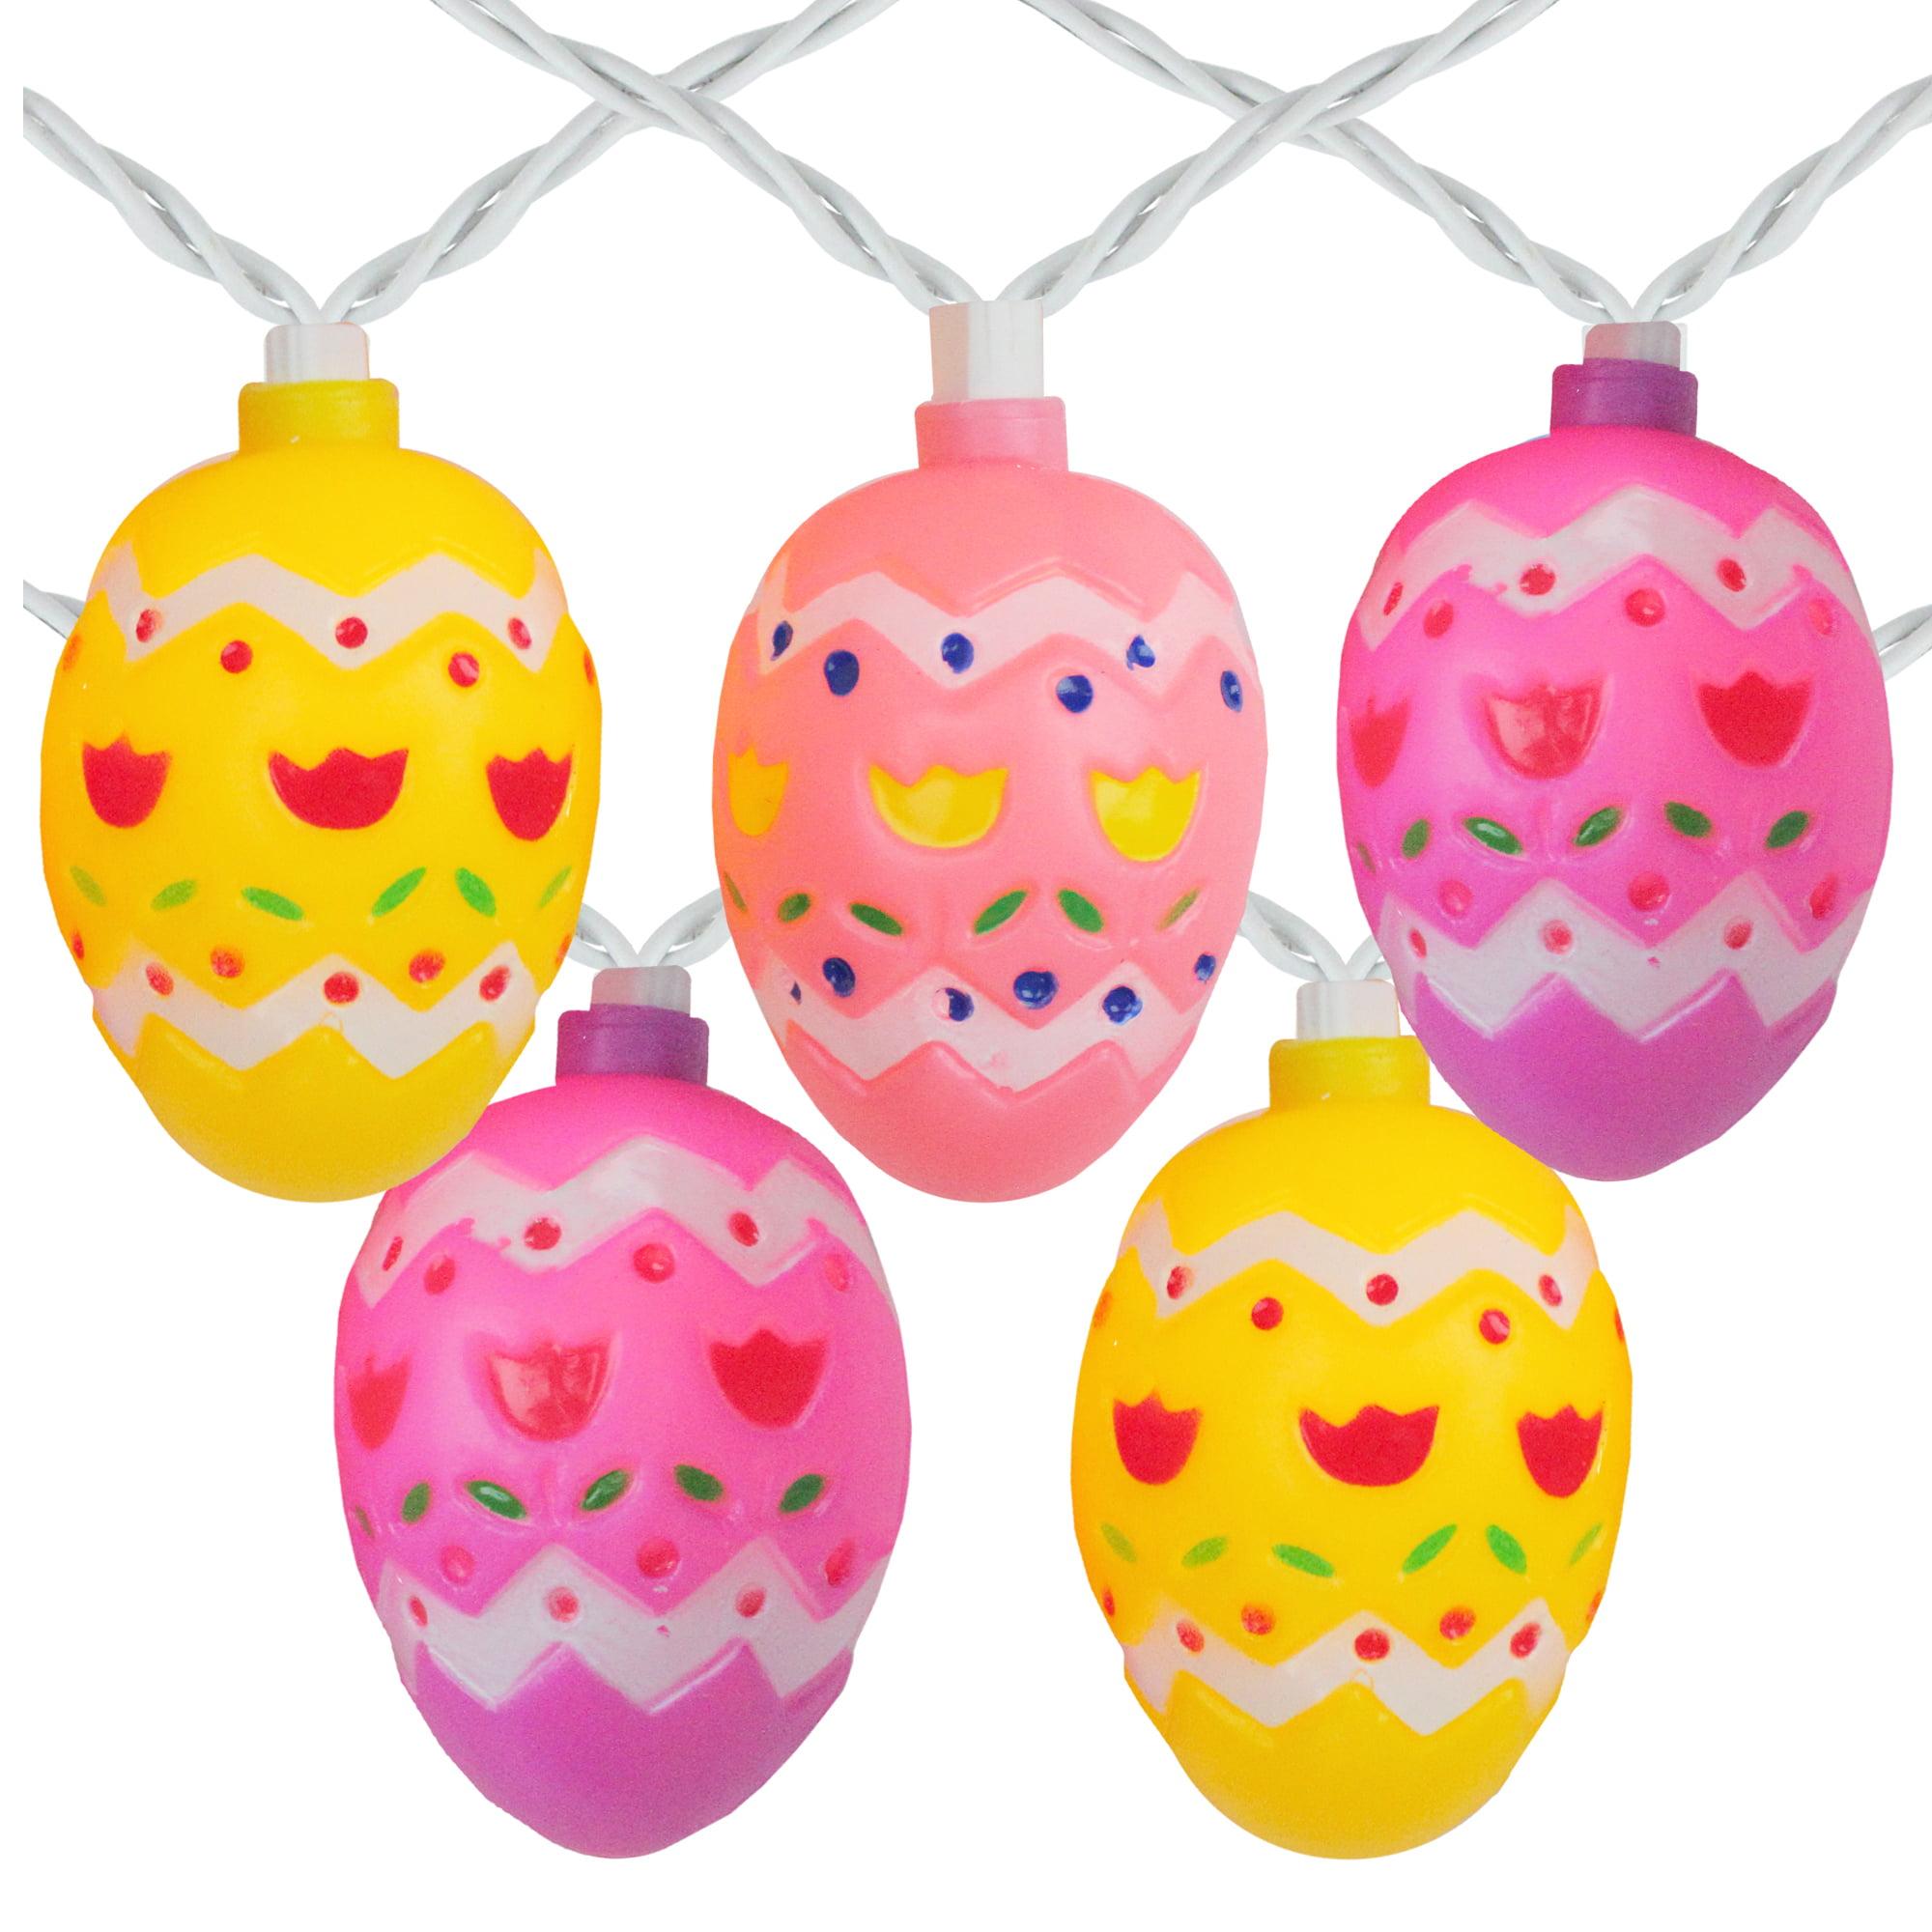 10 Pastel Multi-Color Easter Egg String Lights - 7.25ft. White Wire